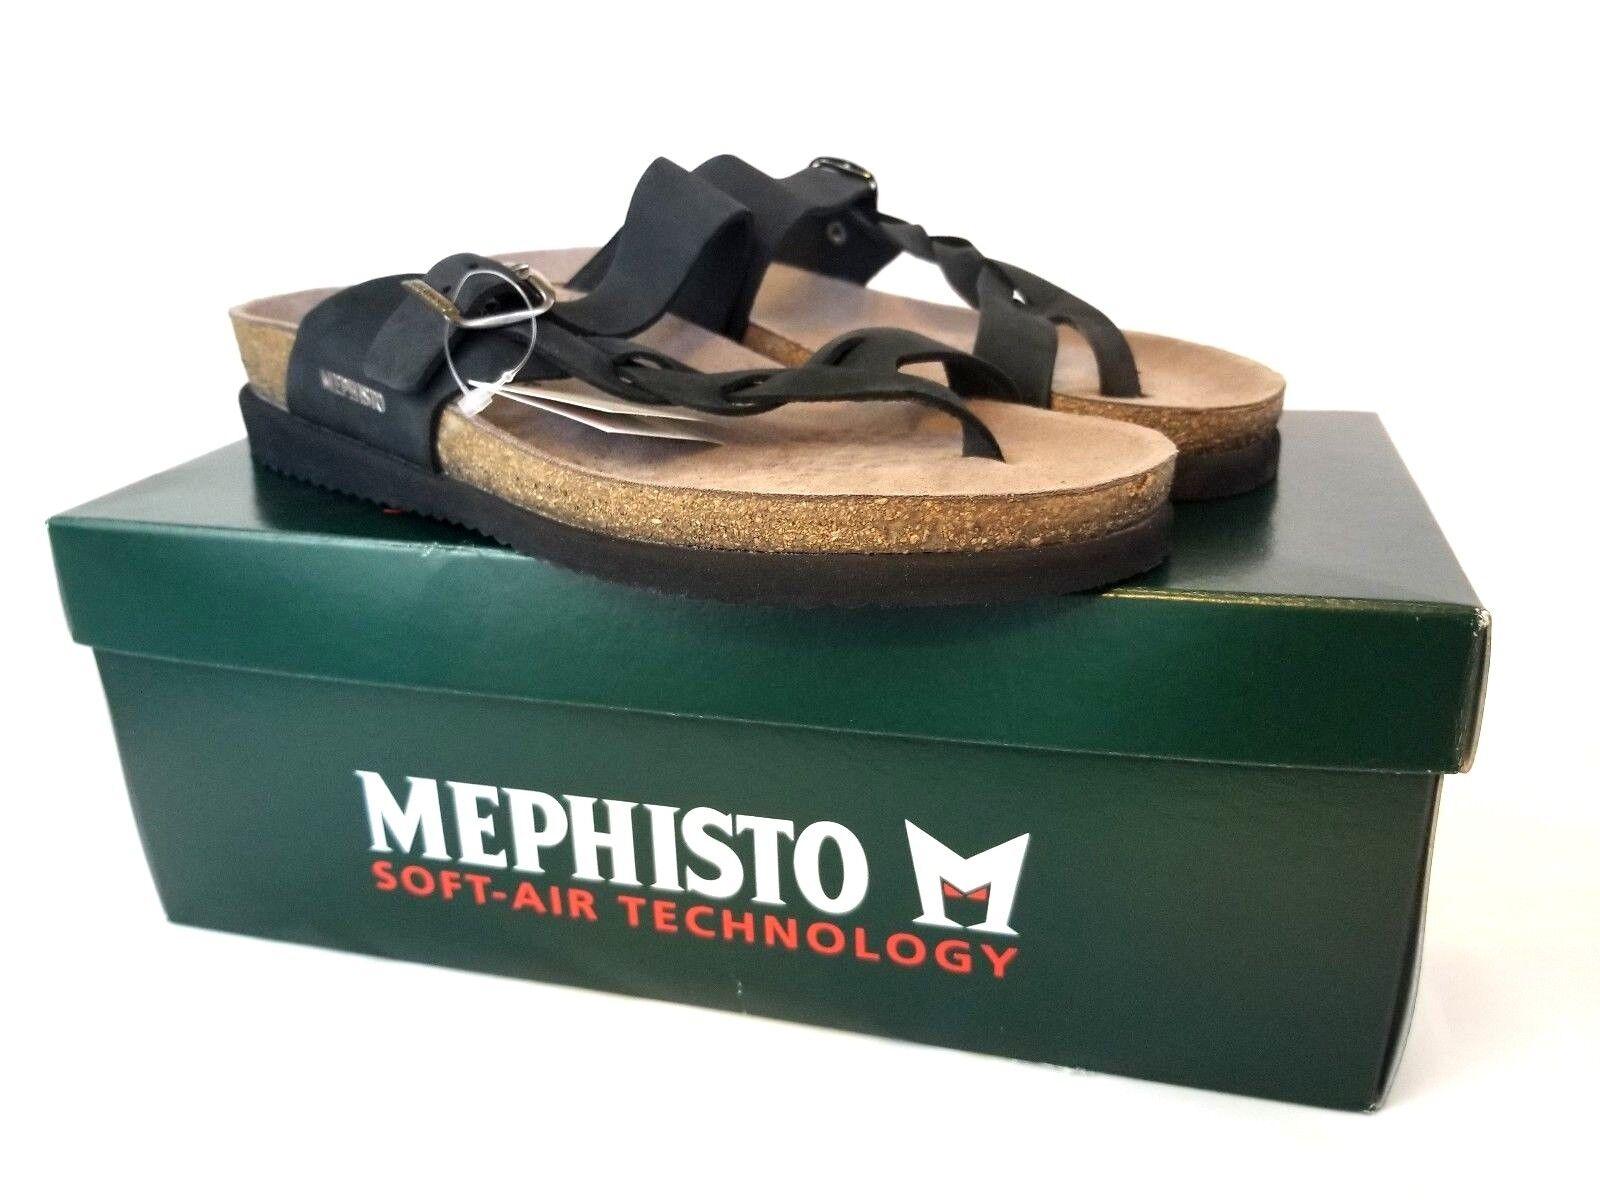 MEPHISTO Donna  Helen Helen Helen Twist Sandals nero Sandalbuck 6000 US 11 EU 41 NEW Z446 60009f